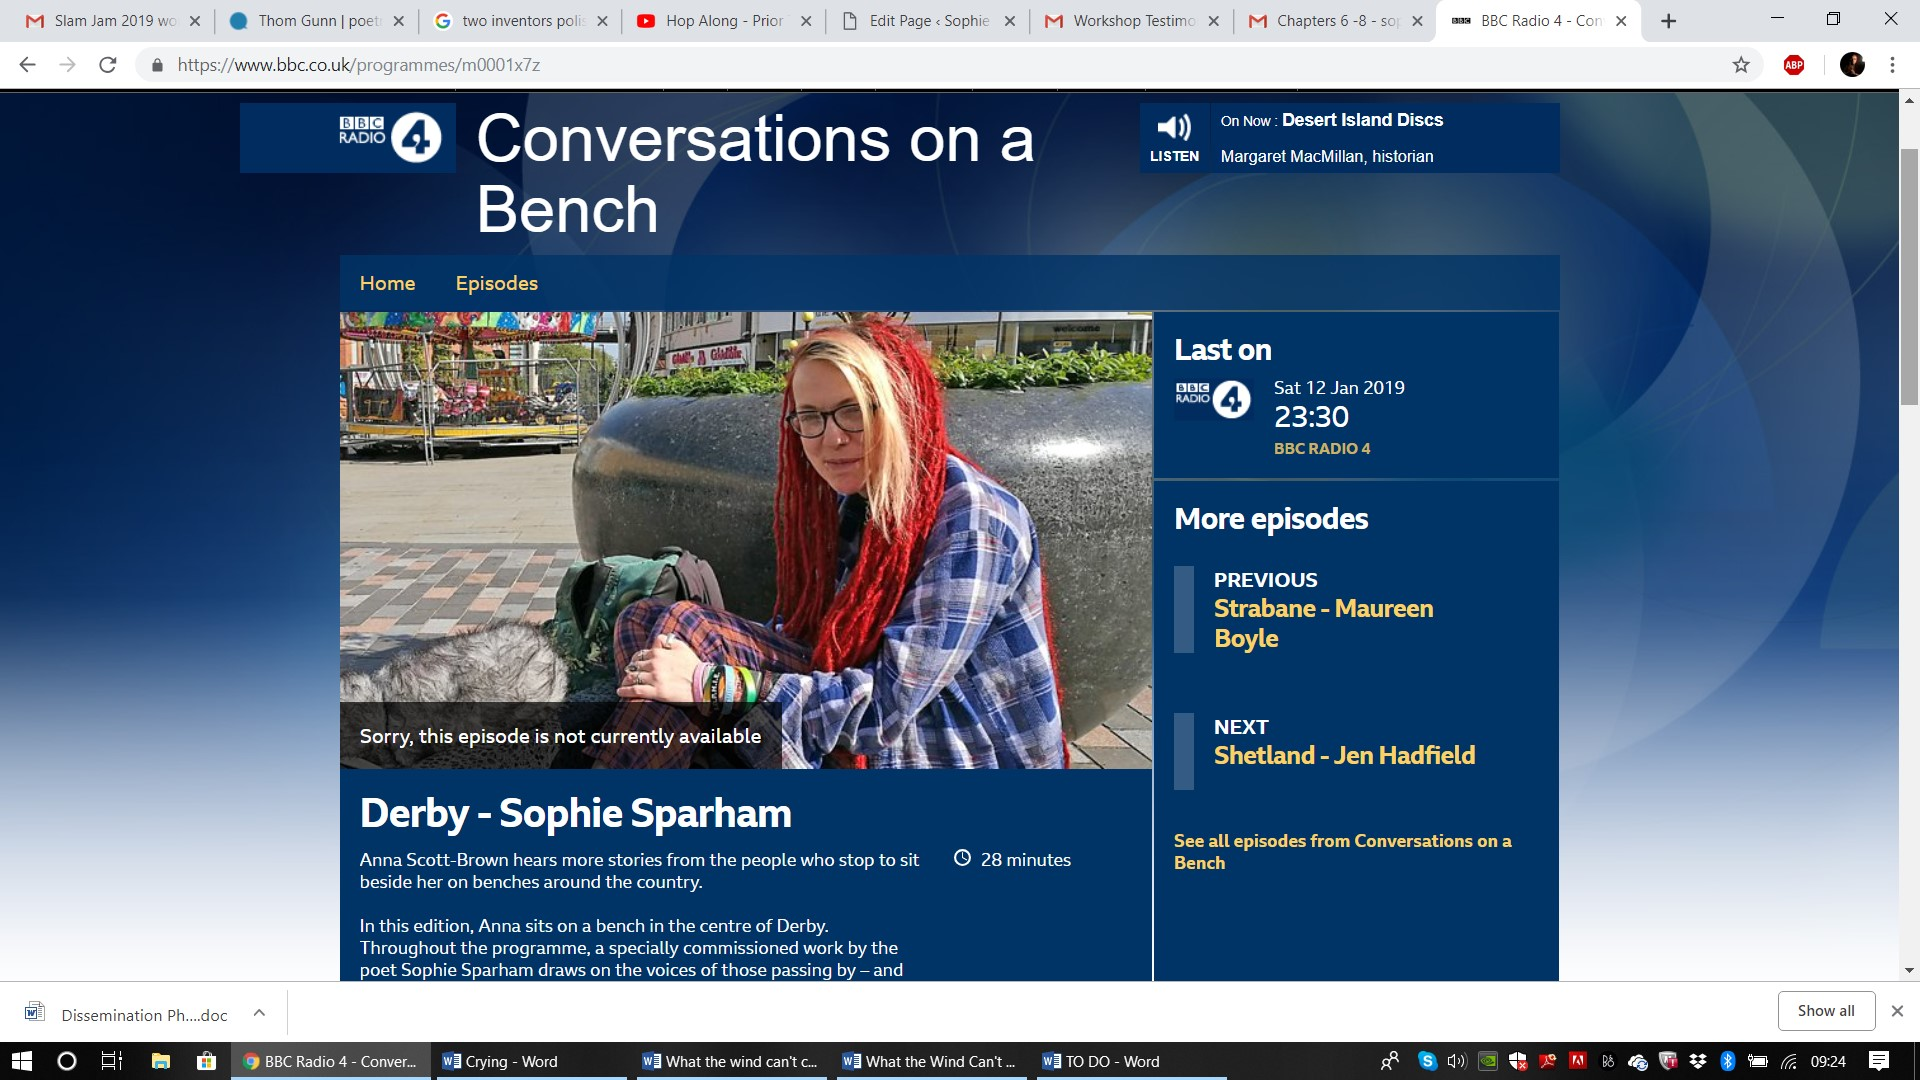 Conversations on a Bench, BBC Radio 4